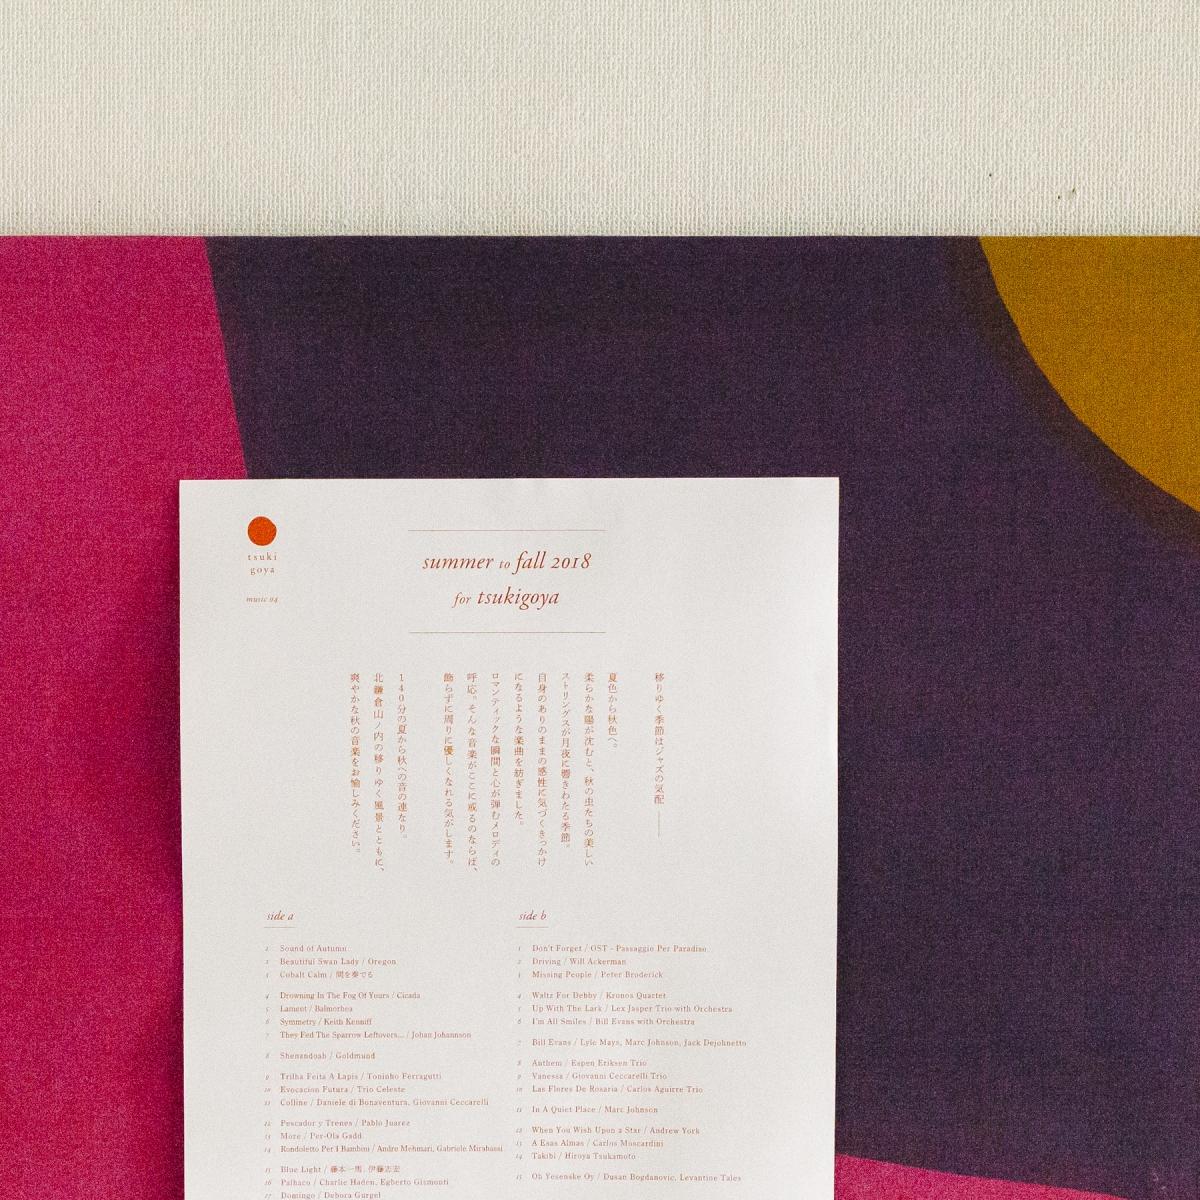 tsukigoya hummock label 音楽選曲 夏から秋2018